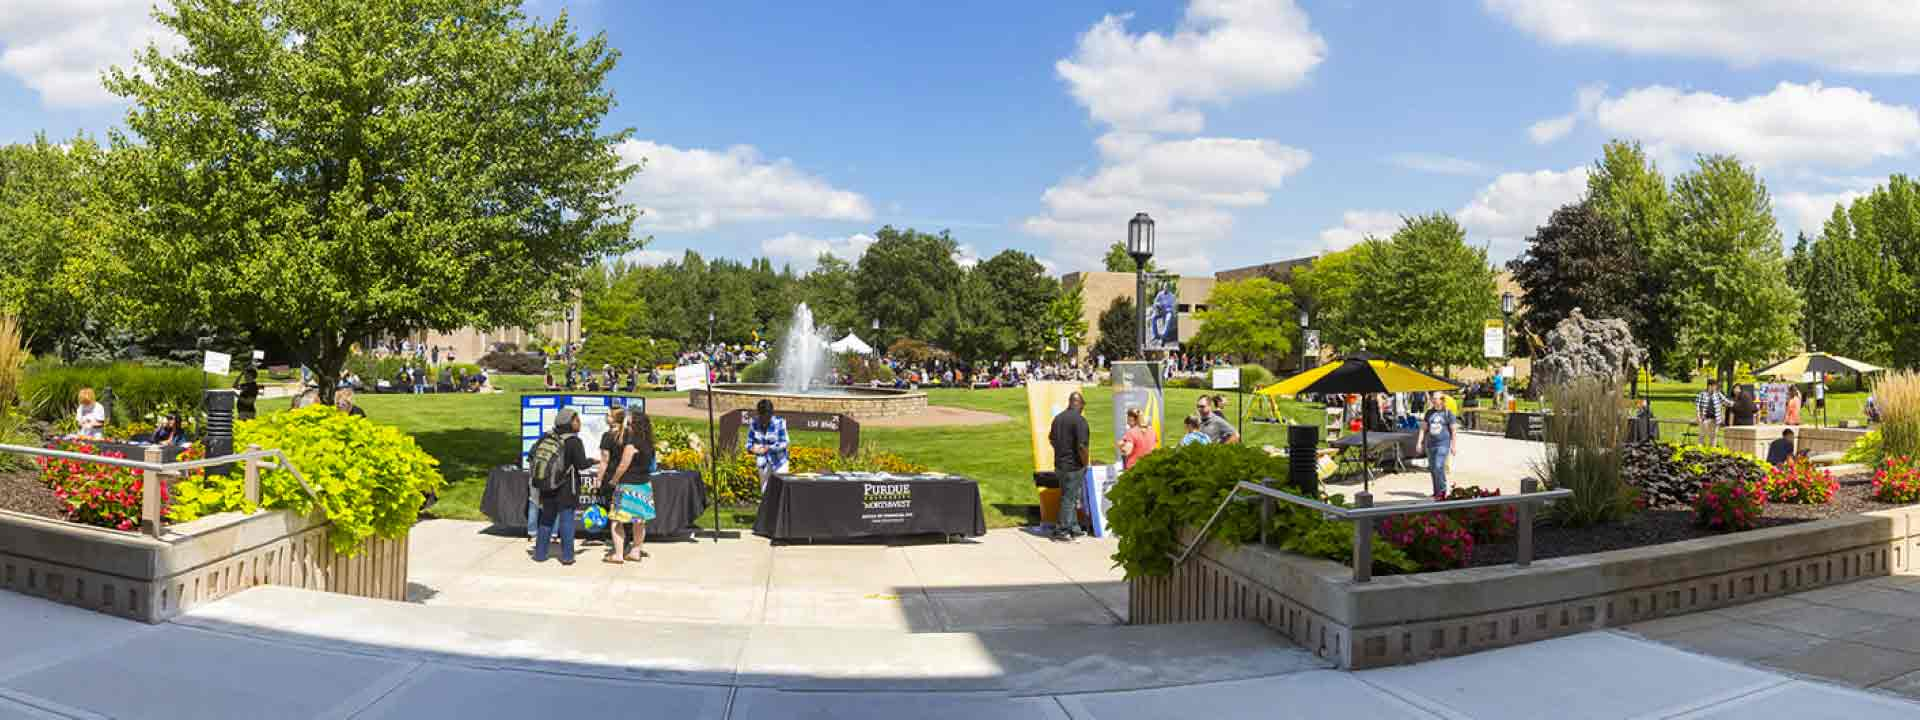 purdue-university-northwest